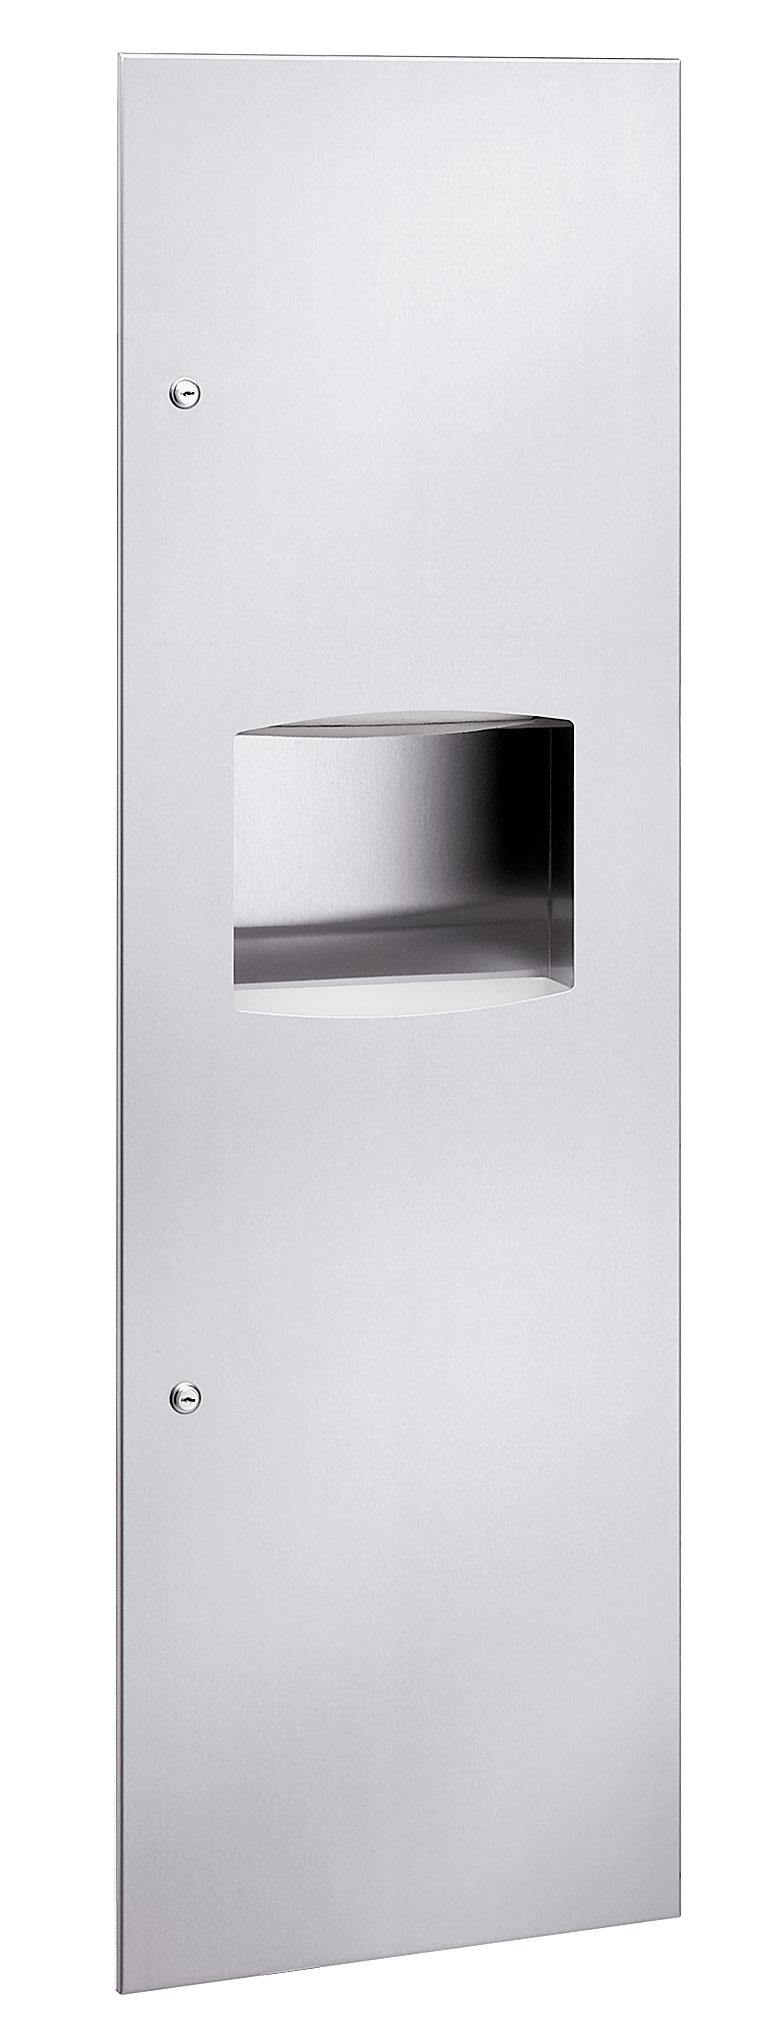 Bradley 2037-11 Surface-Mounted Folded Towel Dispenser & 11.2 gal. Waste Receptacle